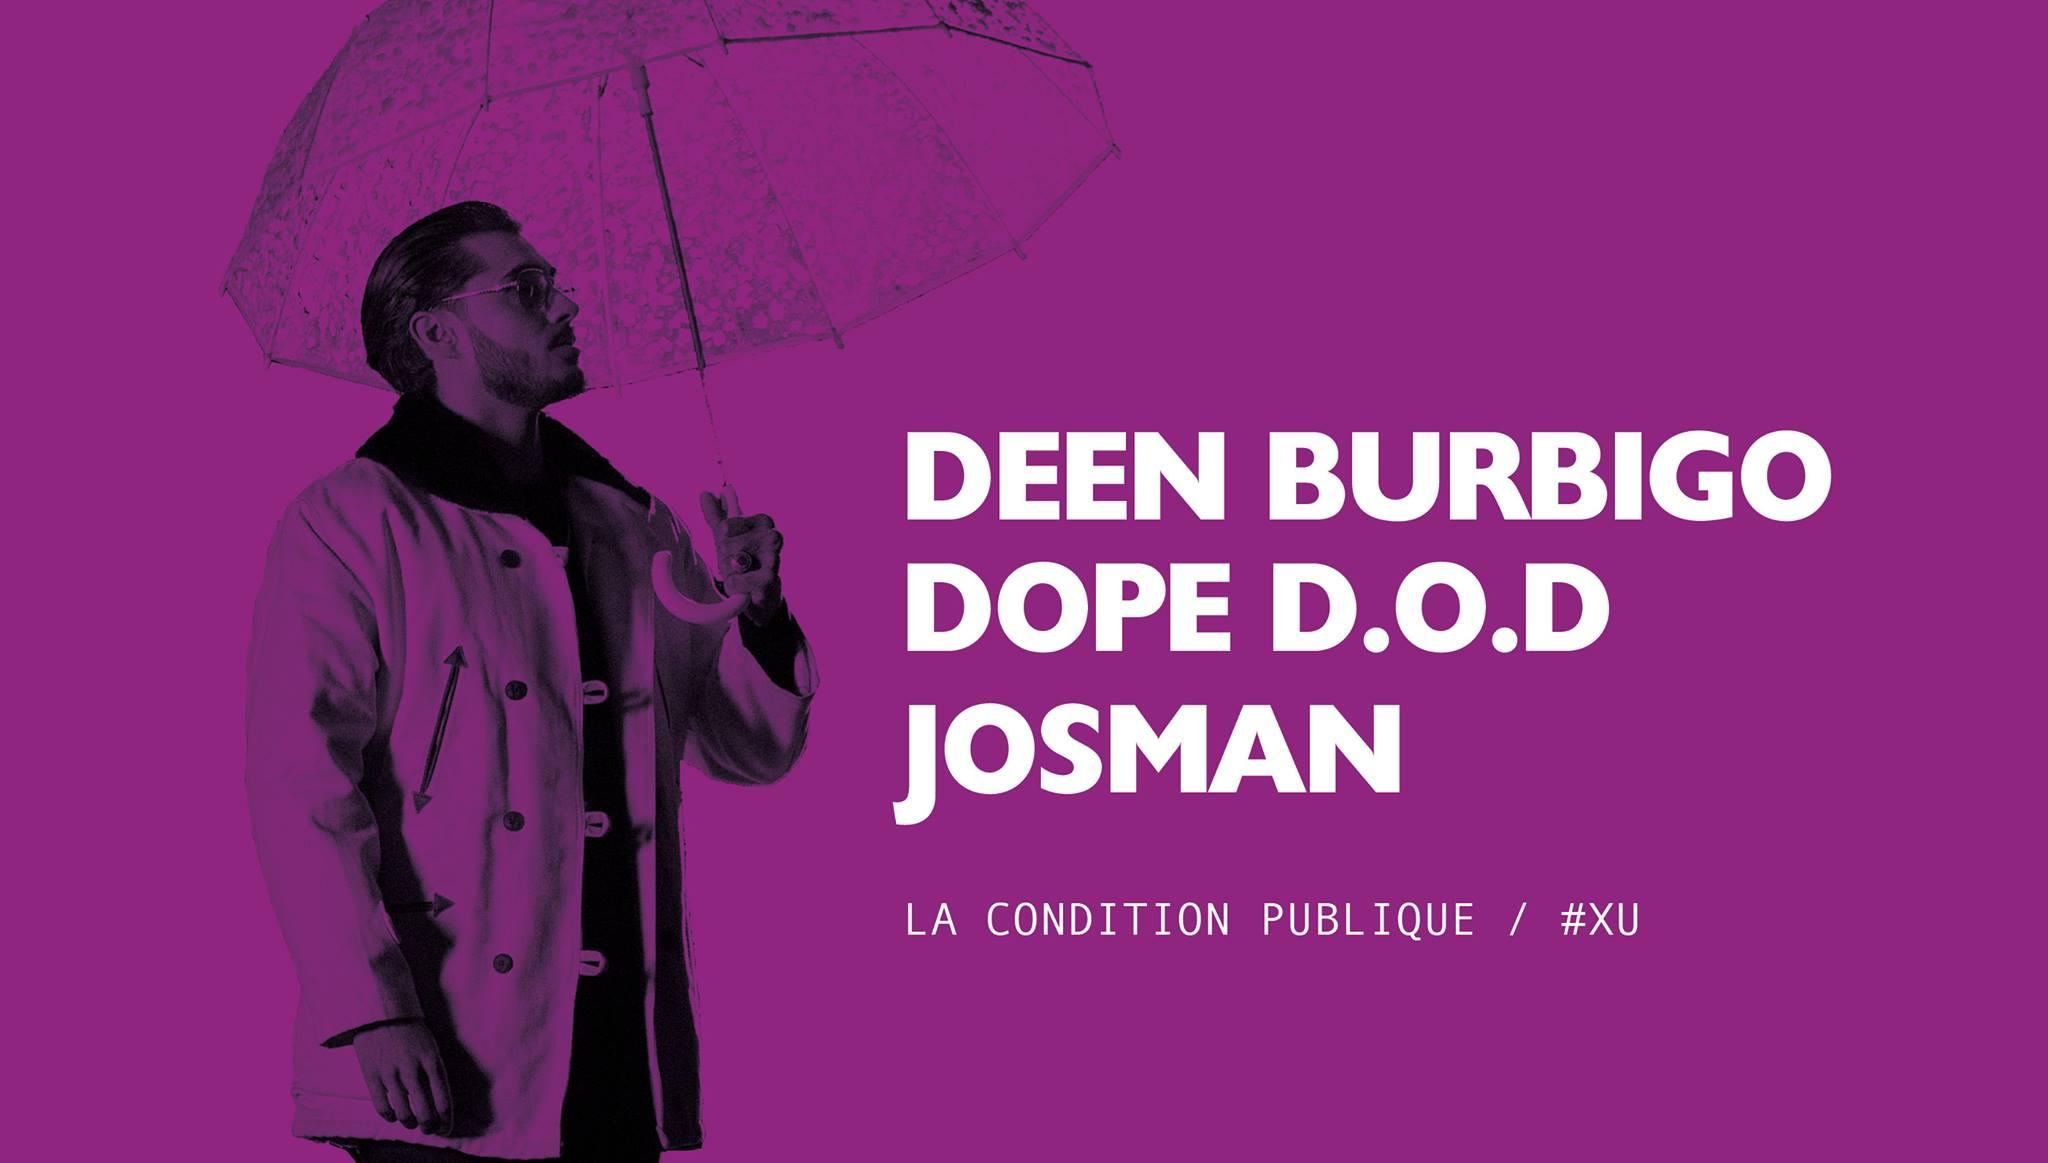 Deen Burbigo + Dope DOD + Josman